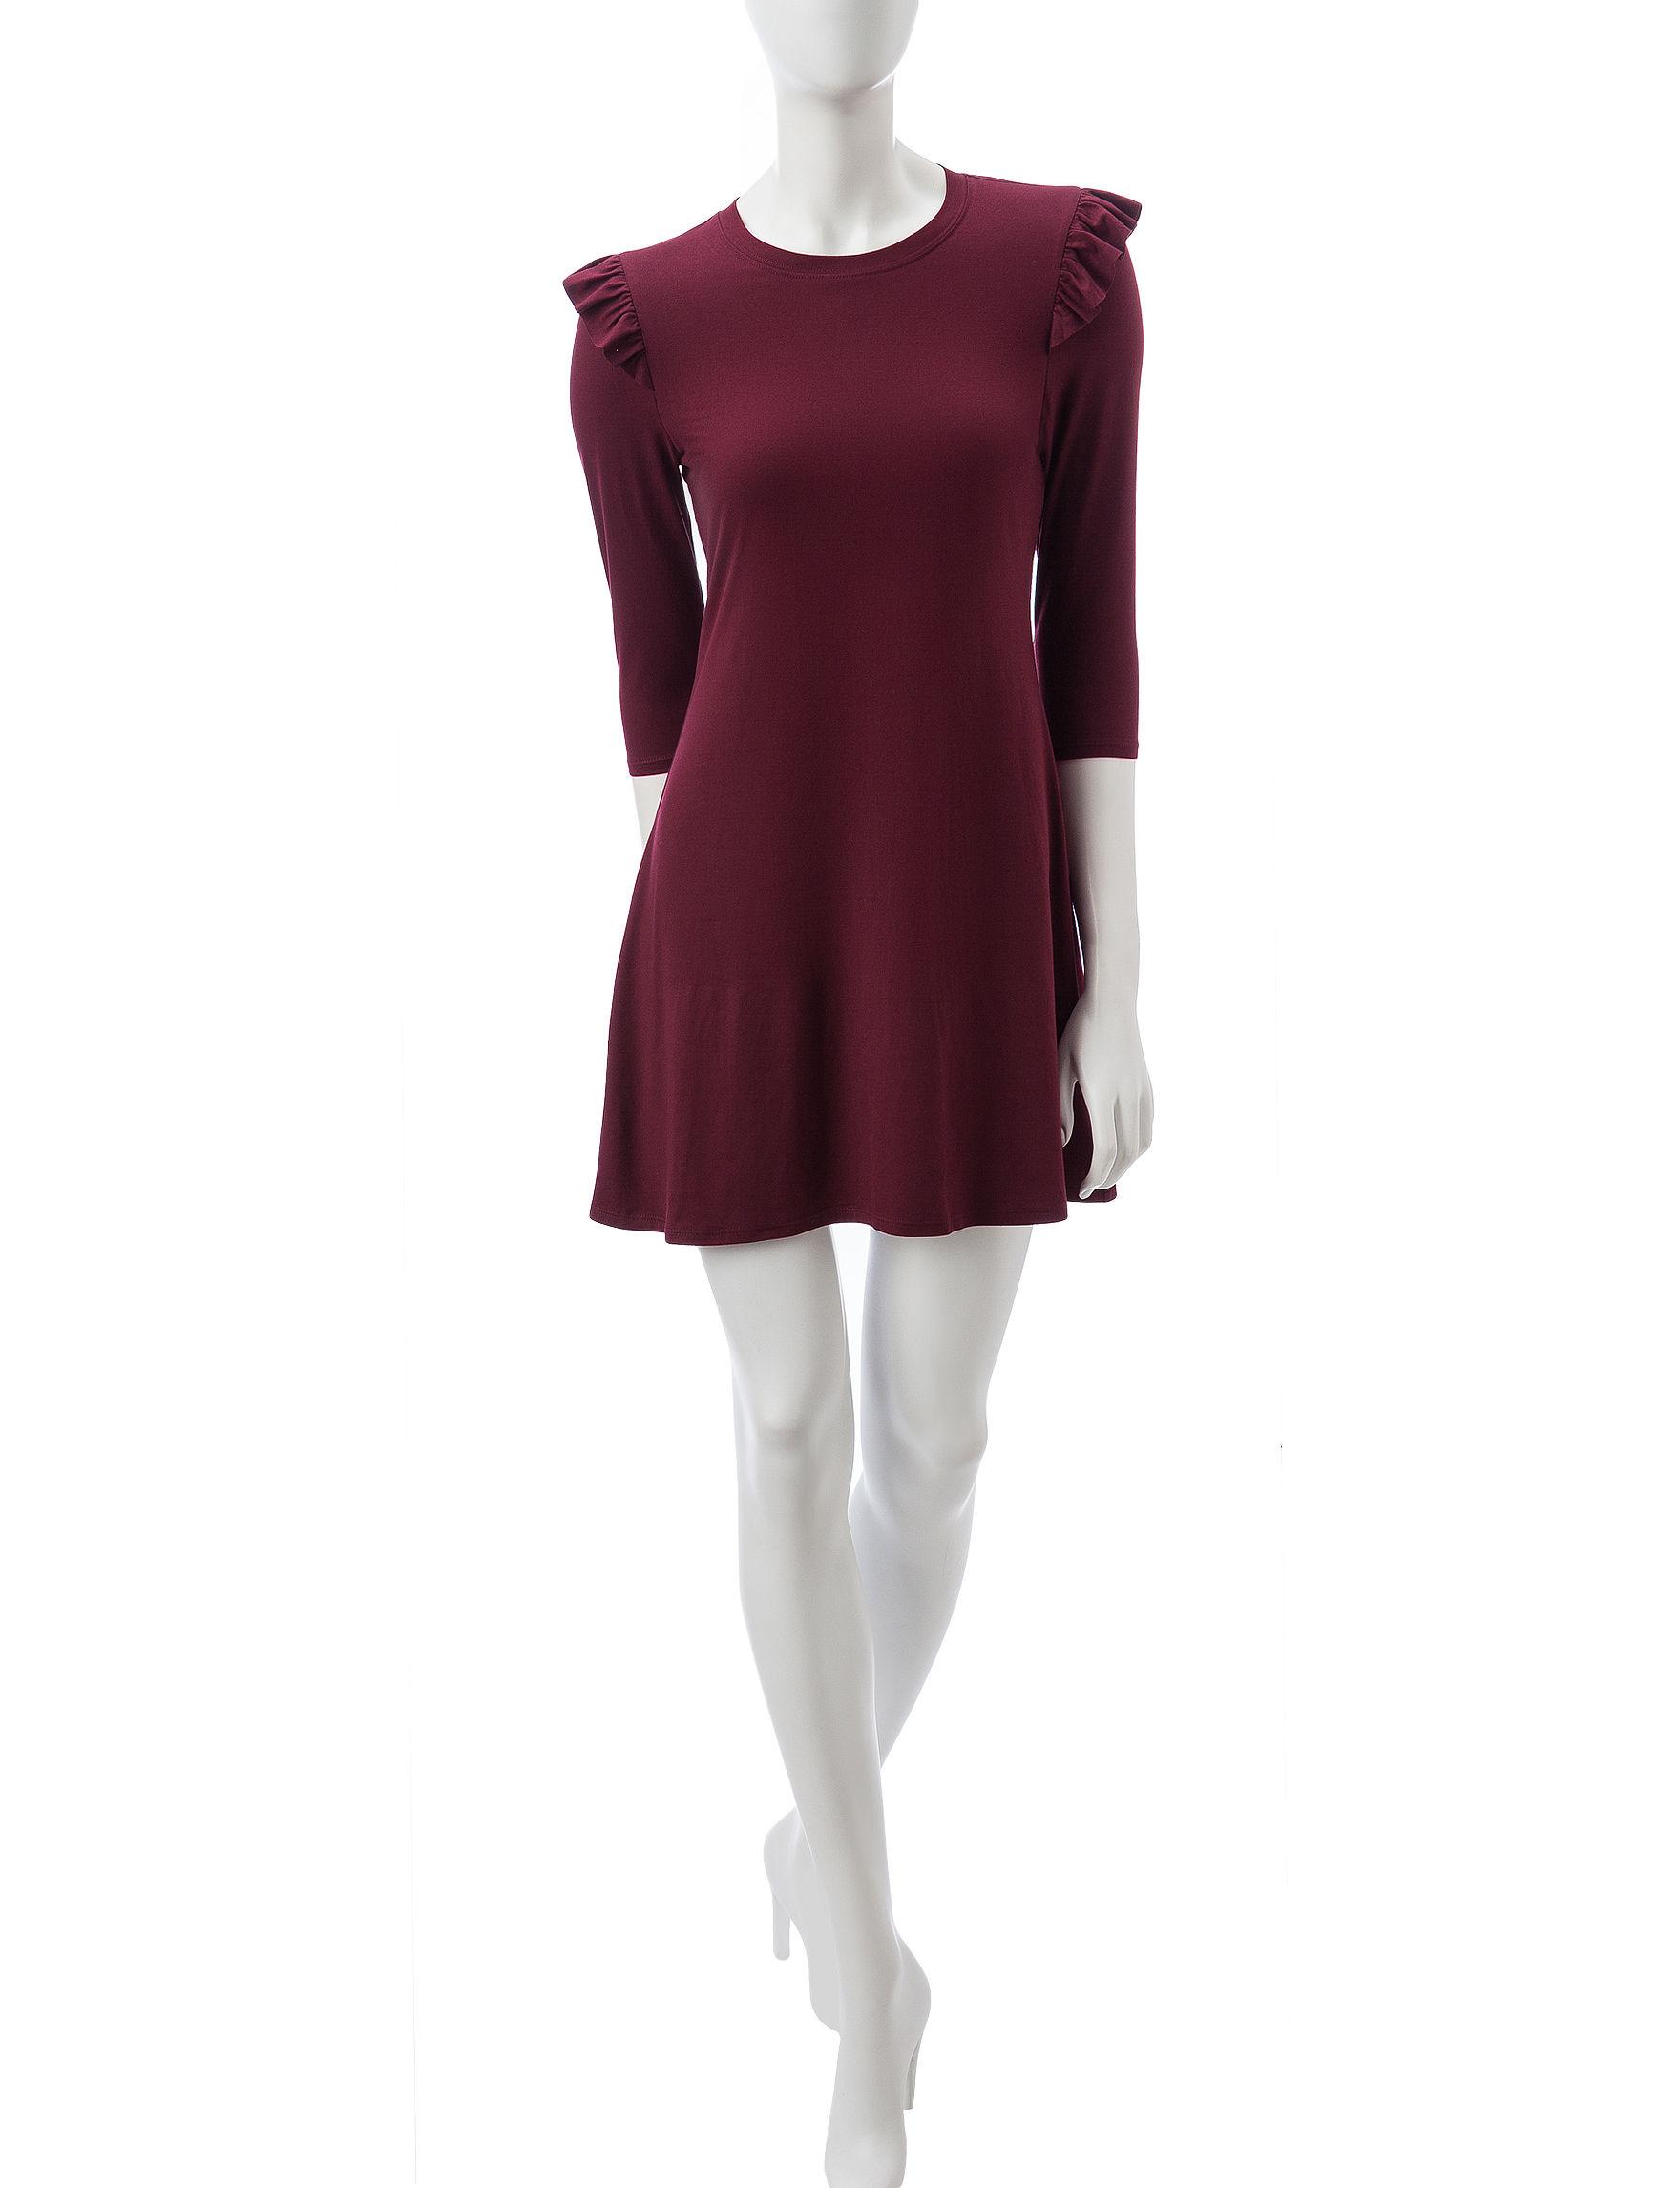 BeBop Wine Everyday & Casual Shift Dresses